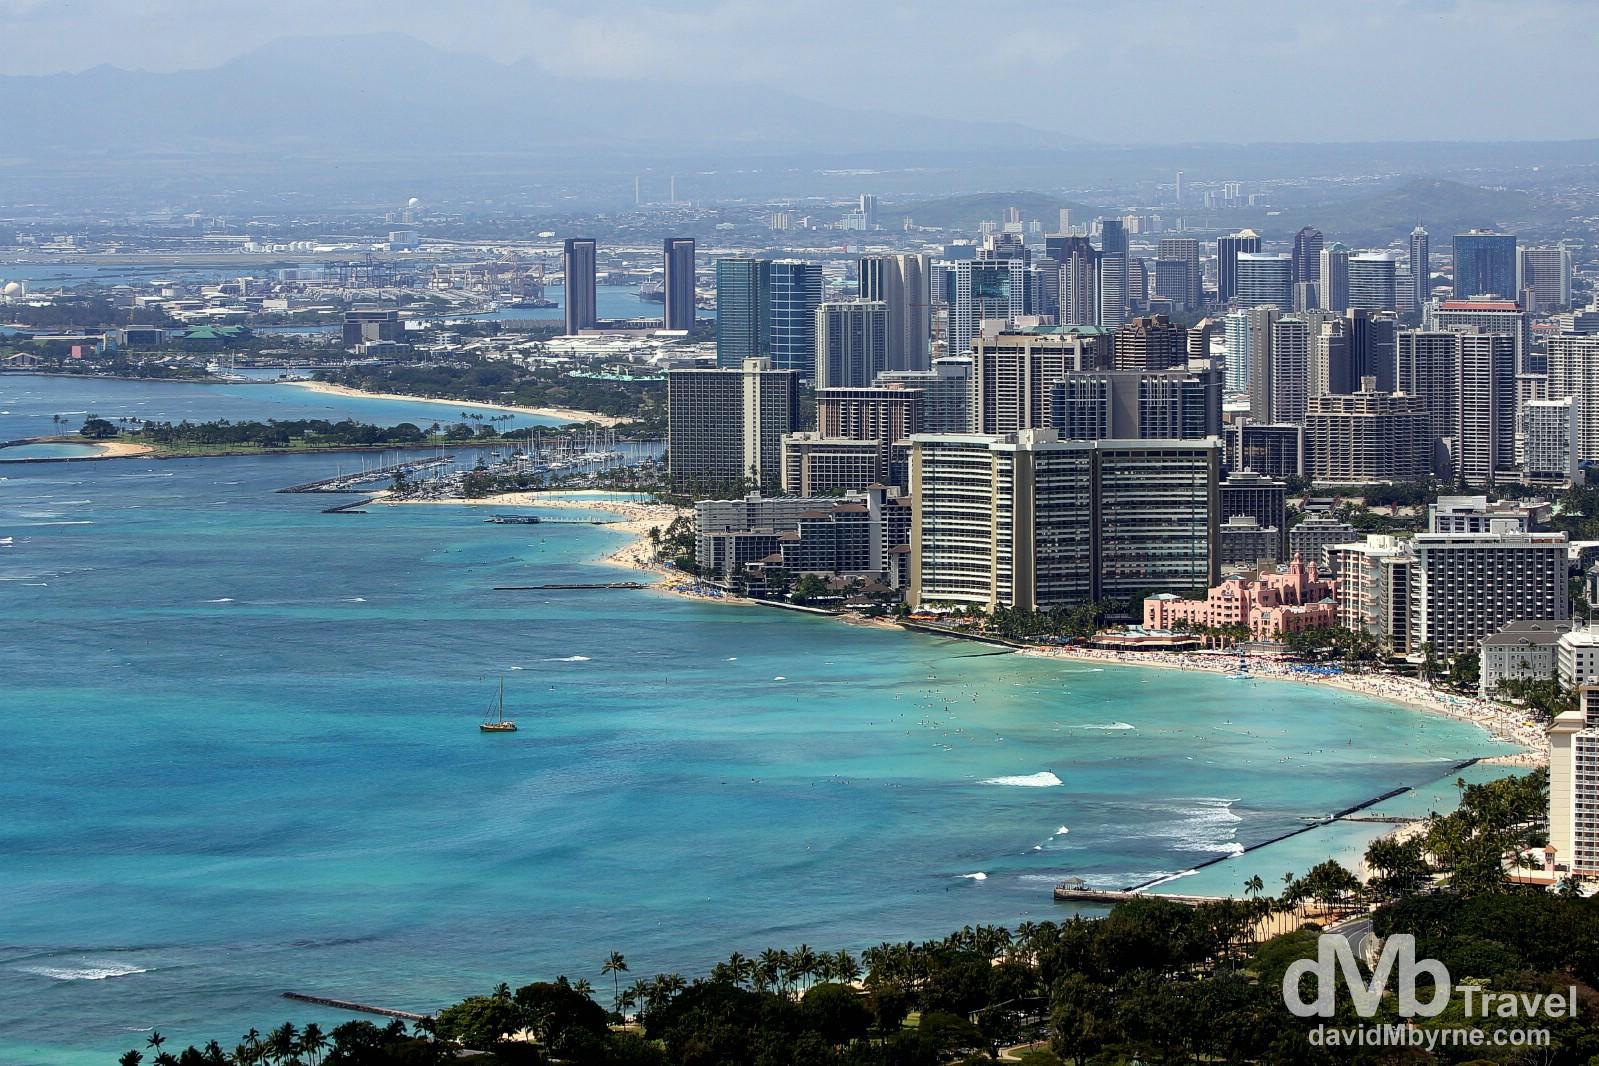 Honolulu & Waikiki Beach areas a seen from the summit of Diamond Head, Oahu, Hawaii, USA. March 11th 2013.